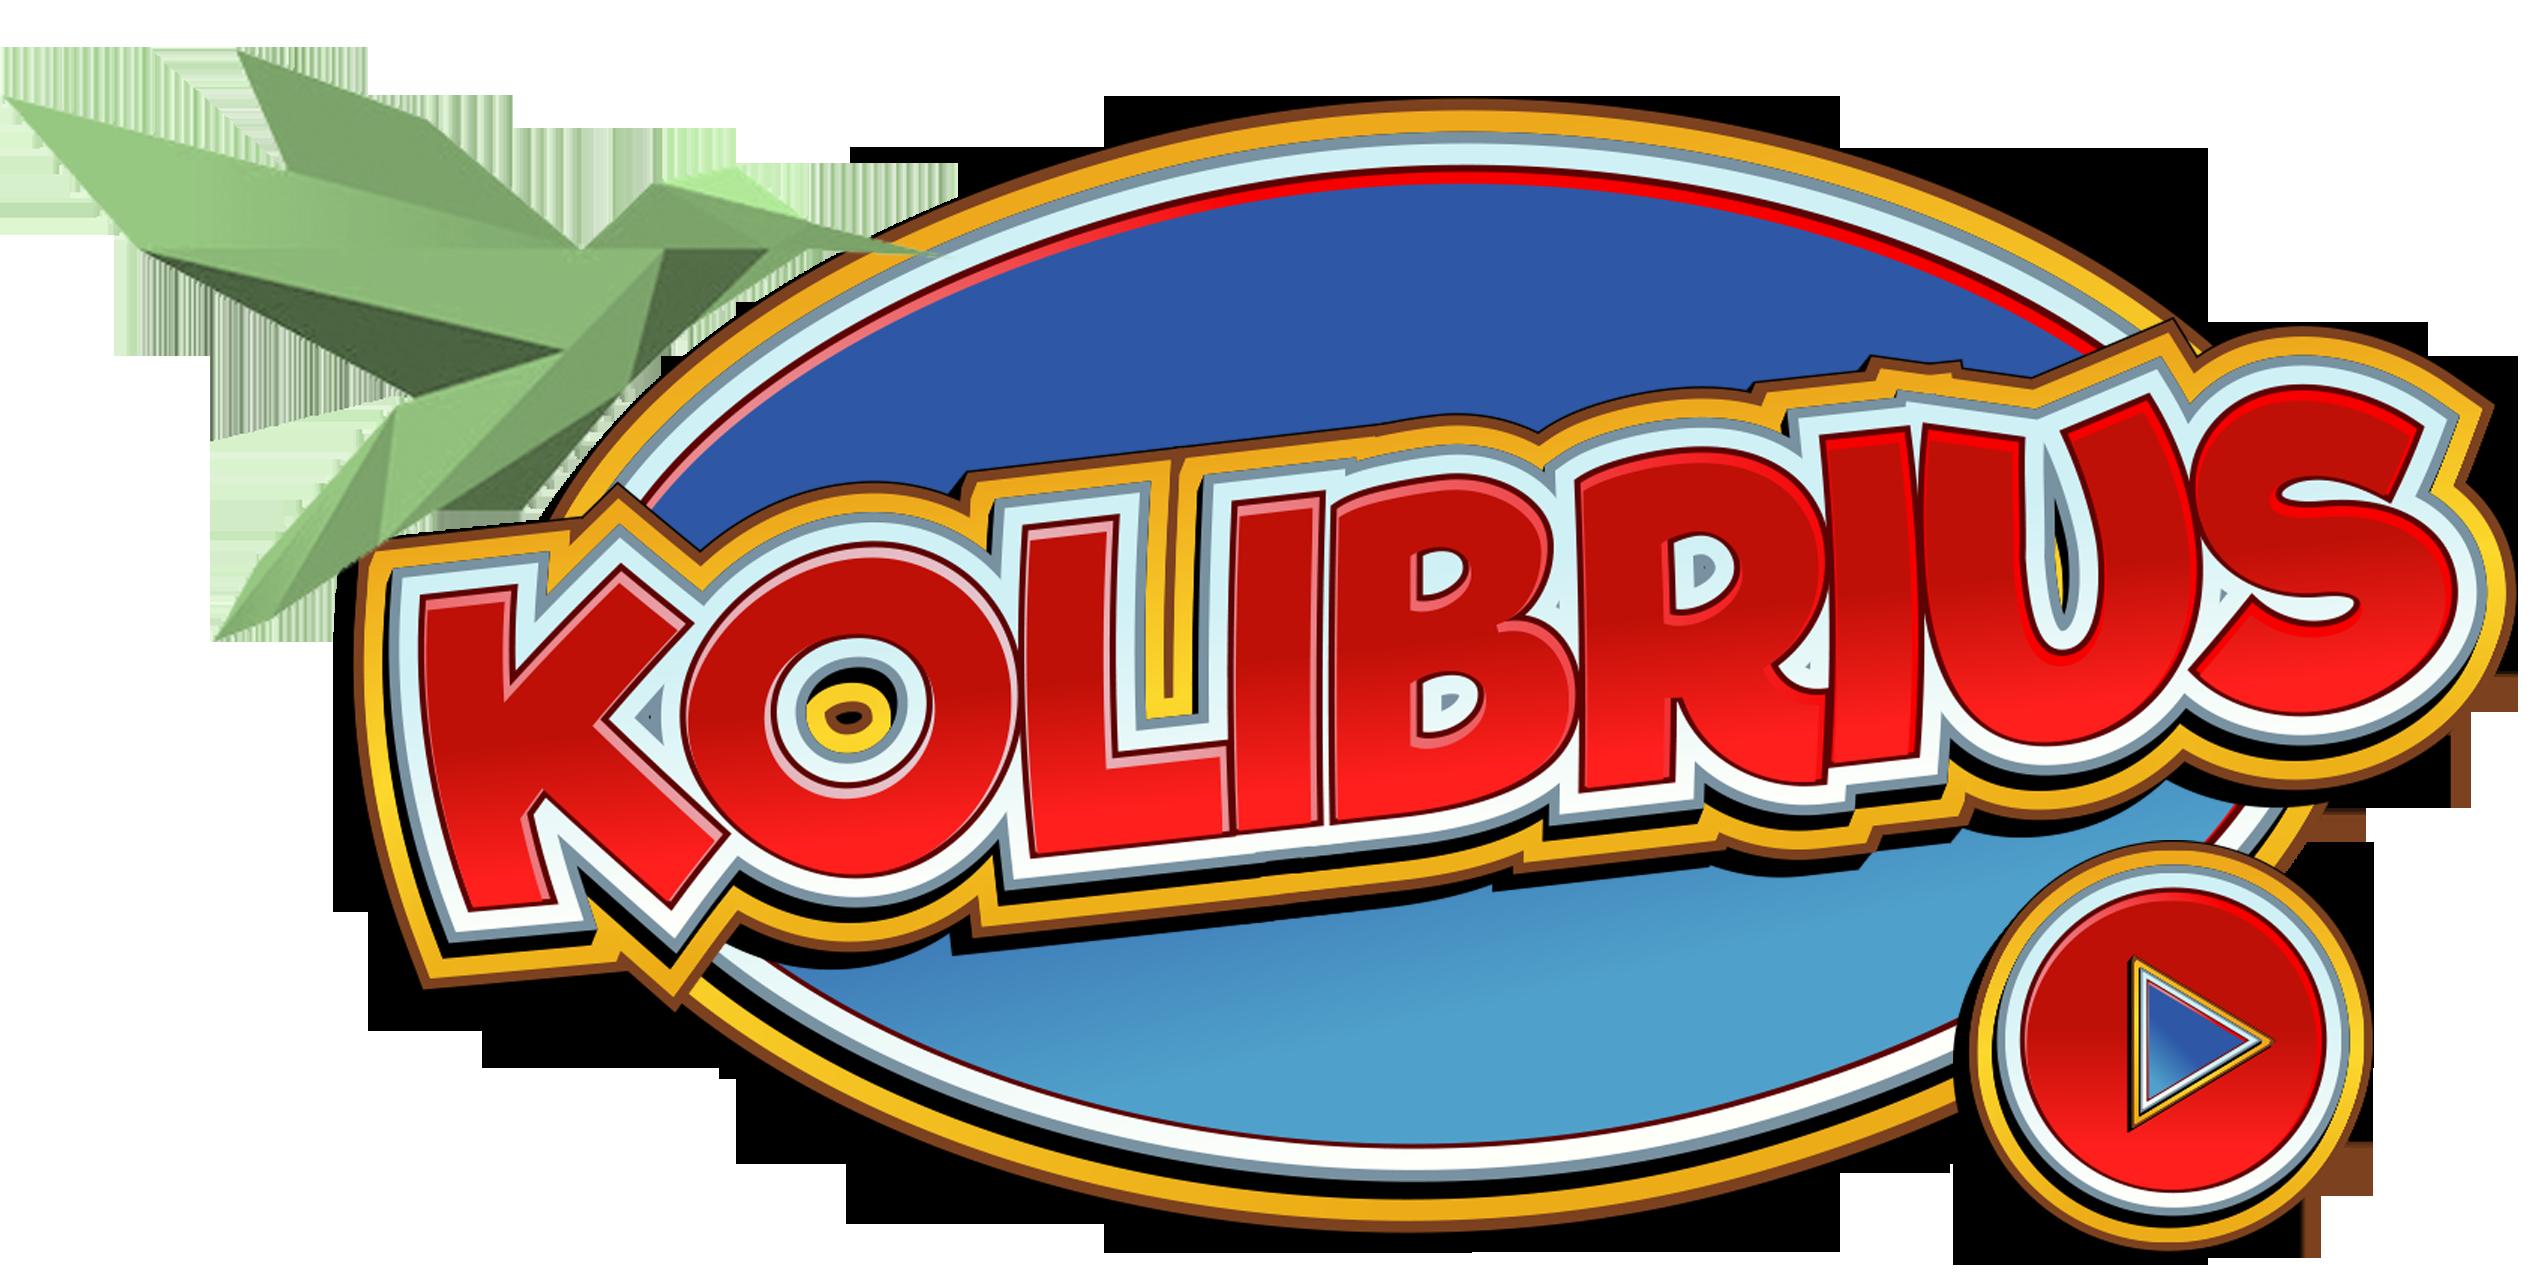 Kolibrius